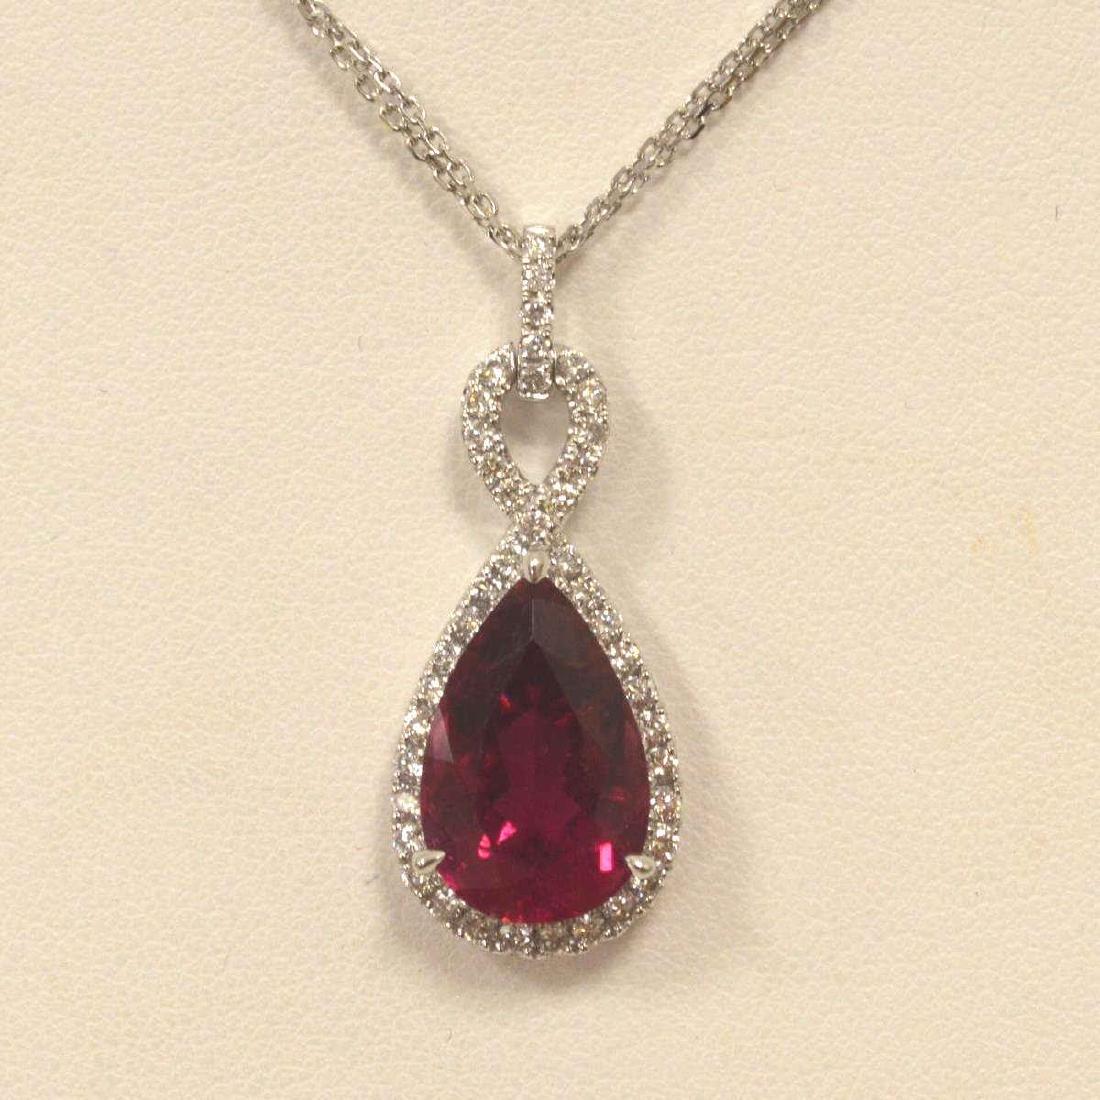 18kt white gold tourmaline and diamond pendant